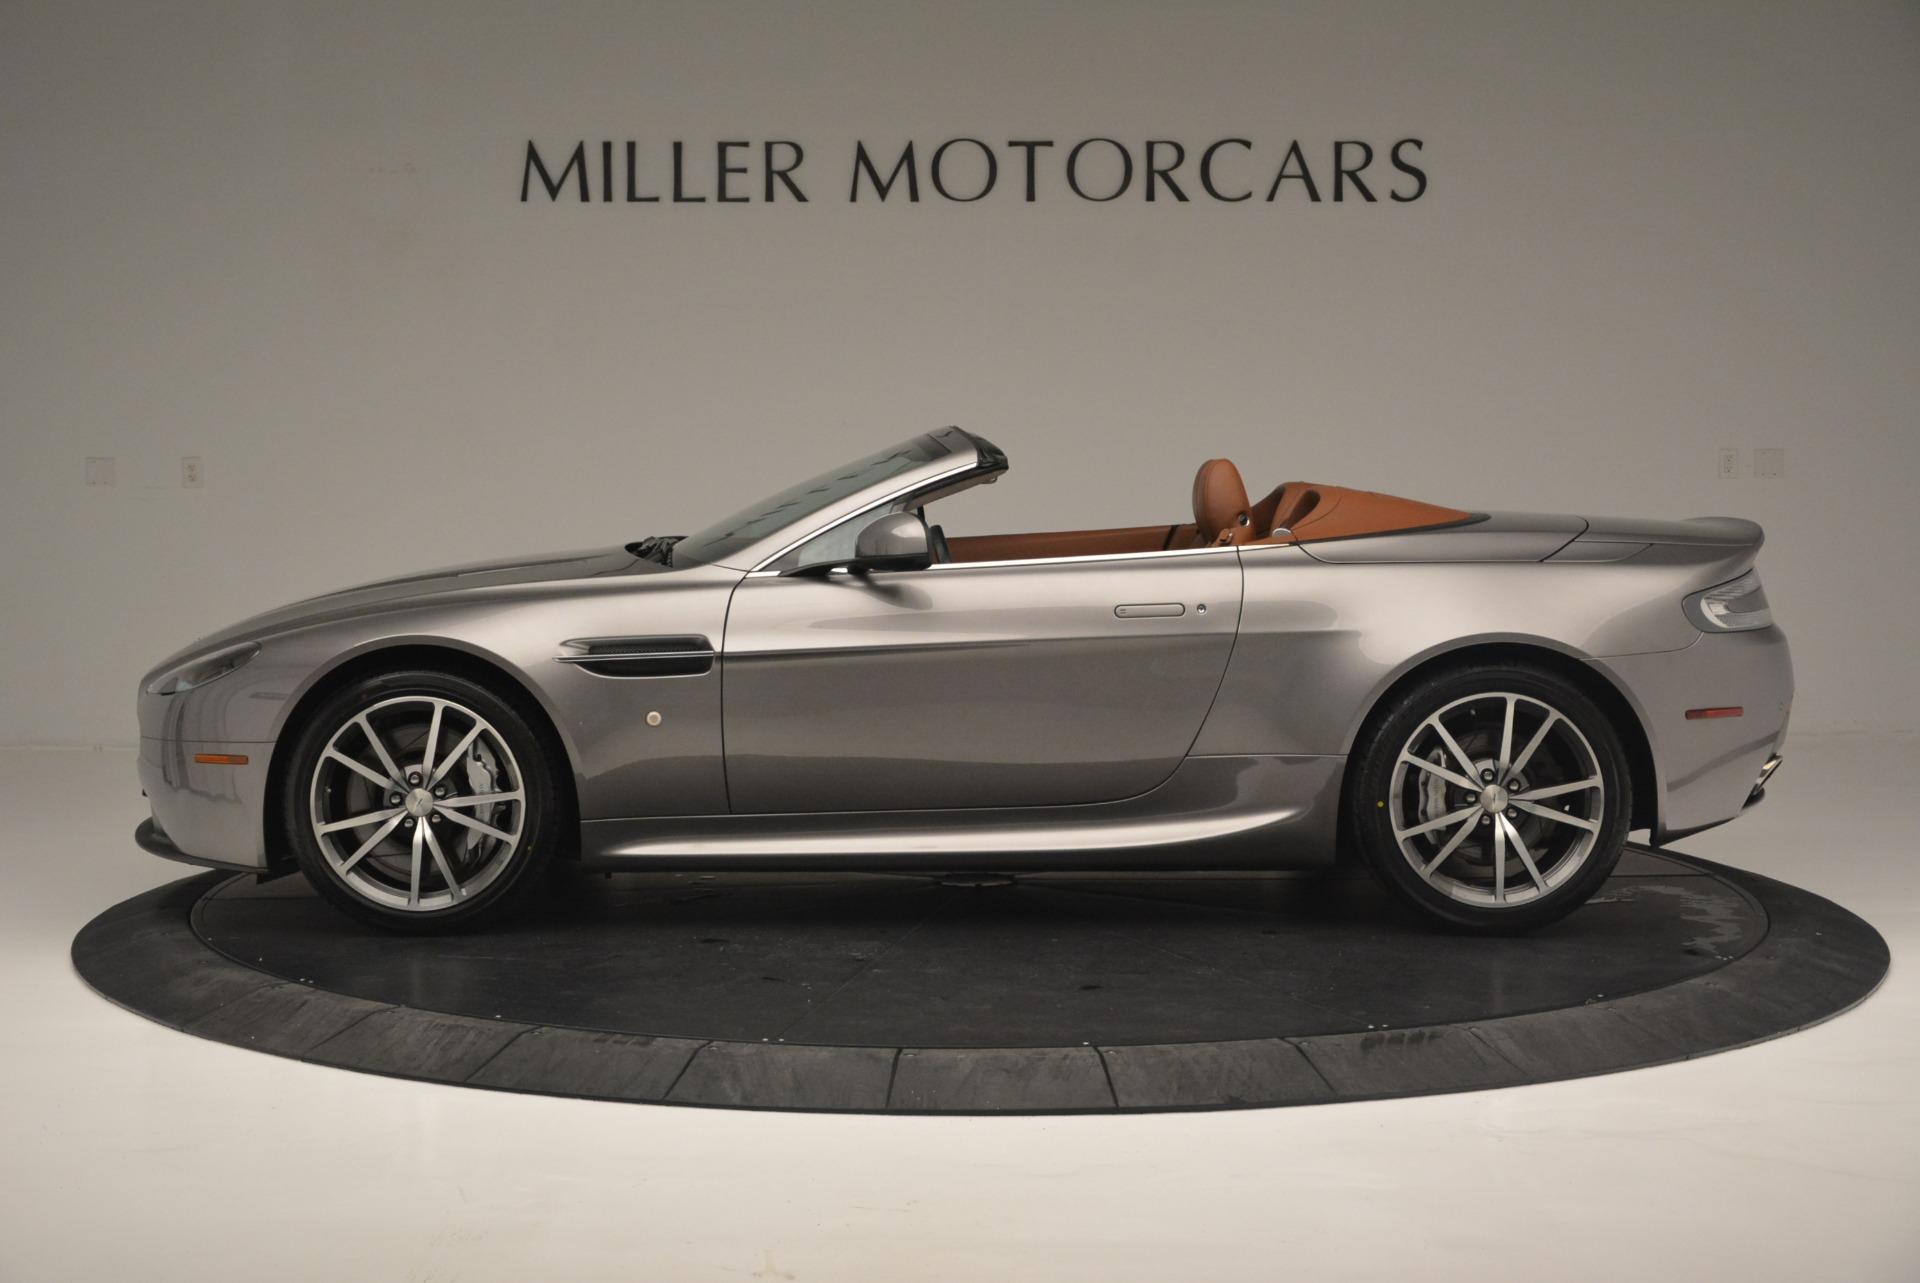 Used 2015 Aston Martin V8 Vantage Roadster For Sale In Greenwich, CT. Alfa Romeo of Greenwich, 7396 2463_p3